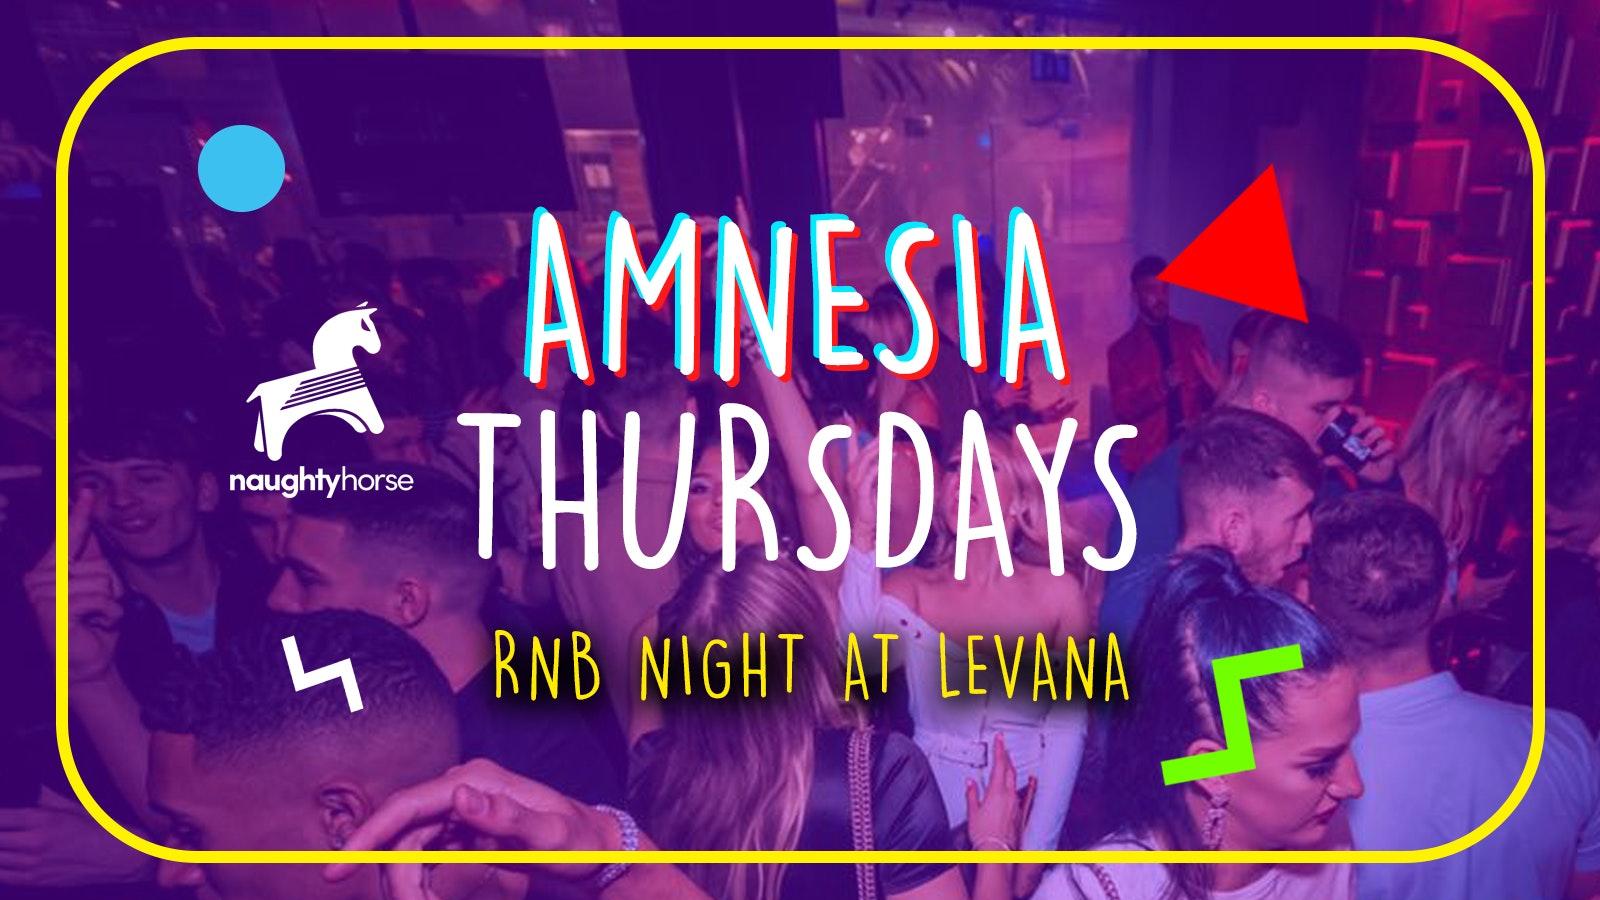 Amnesia Thursdays – Levana [Naughty Horse]